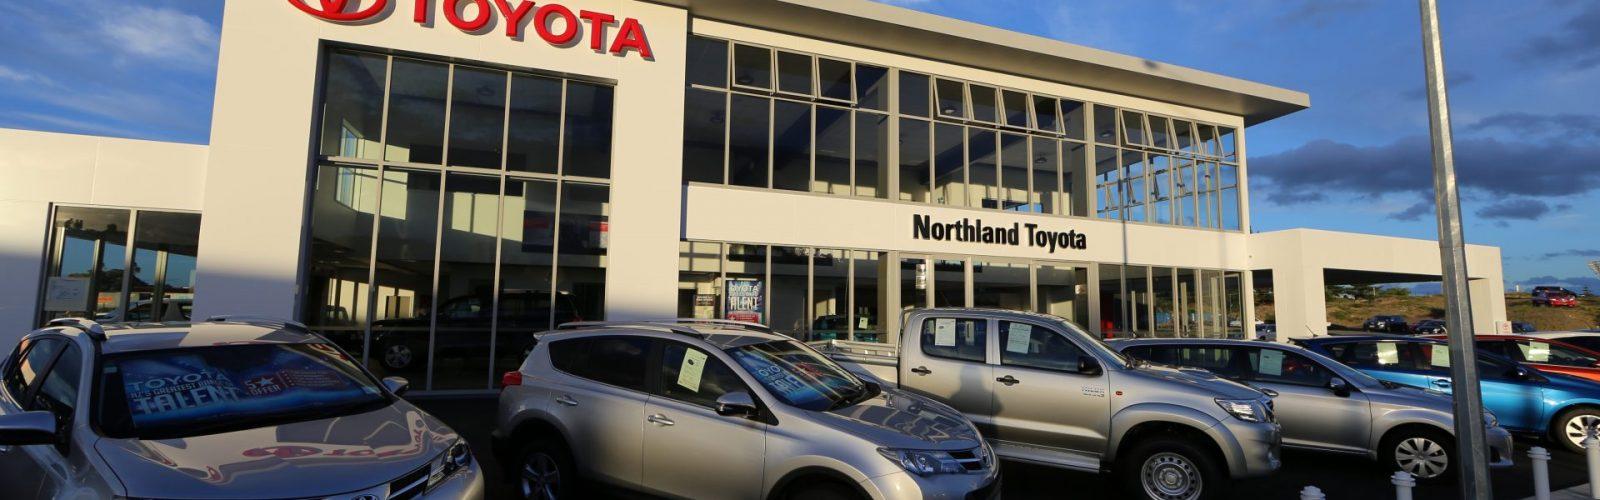 Northland Toyota - Header Image